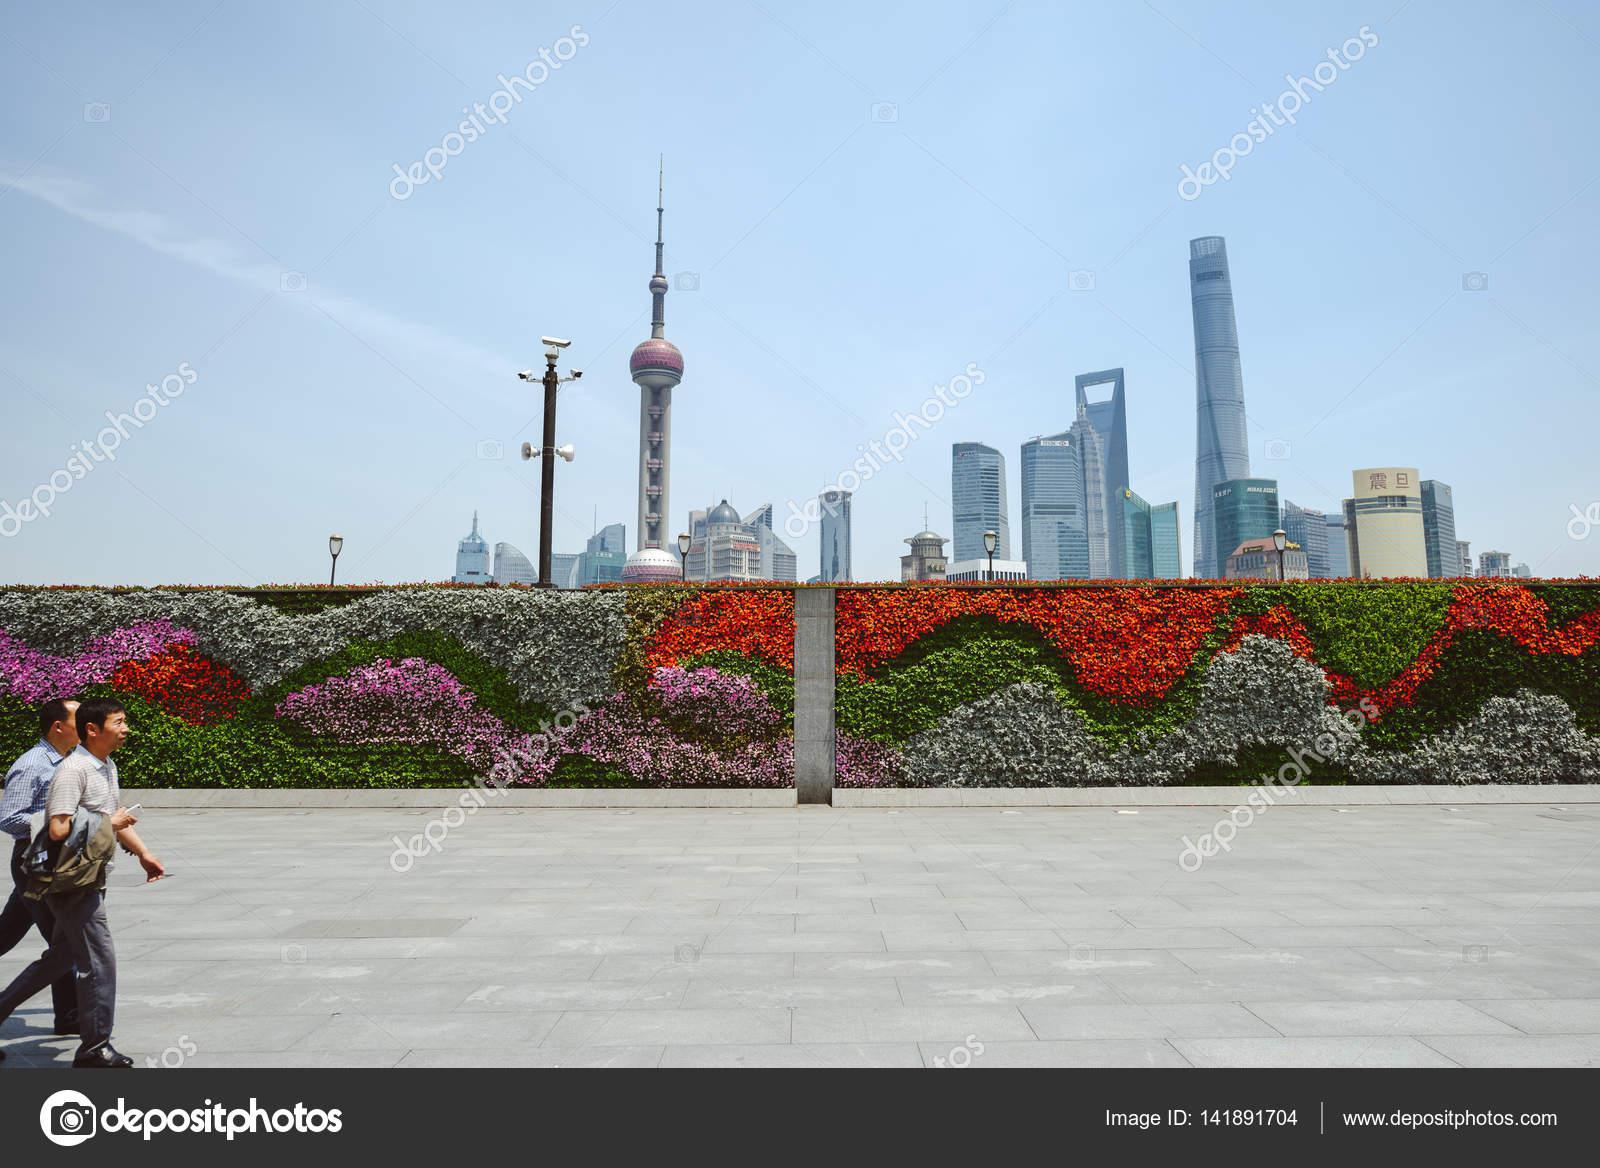 Shanghai skyline wallpaper | The Wall